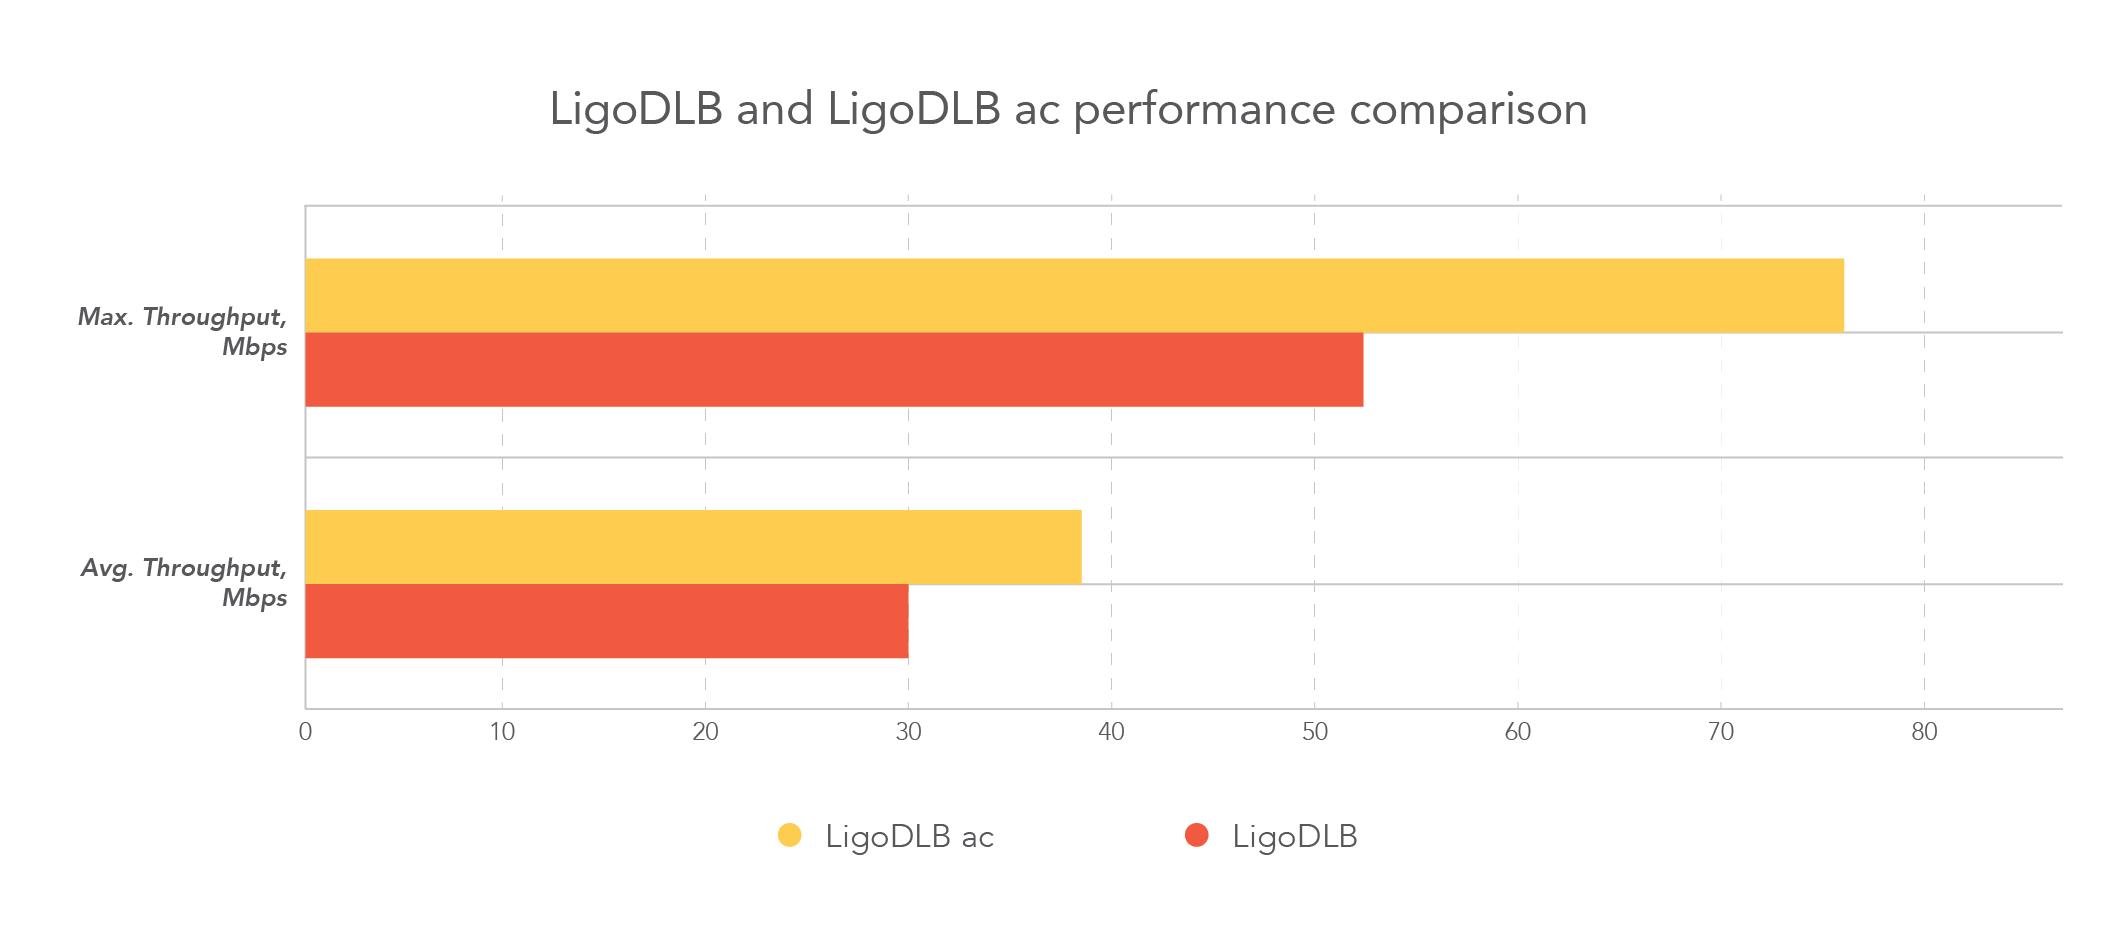 DLB ir DLB ac comparison - graphic